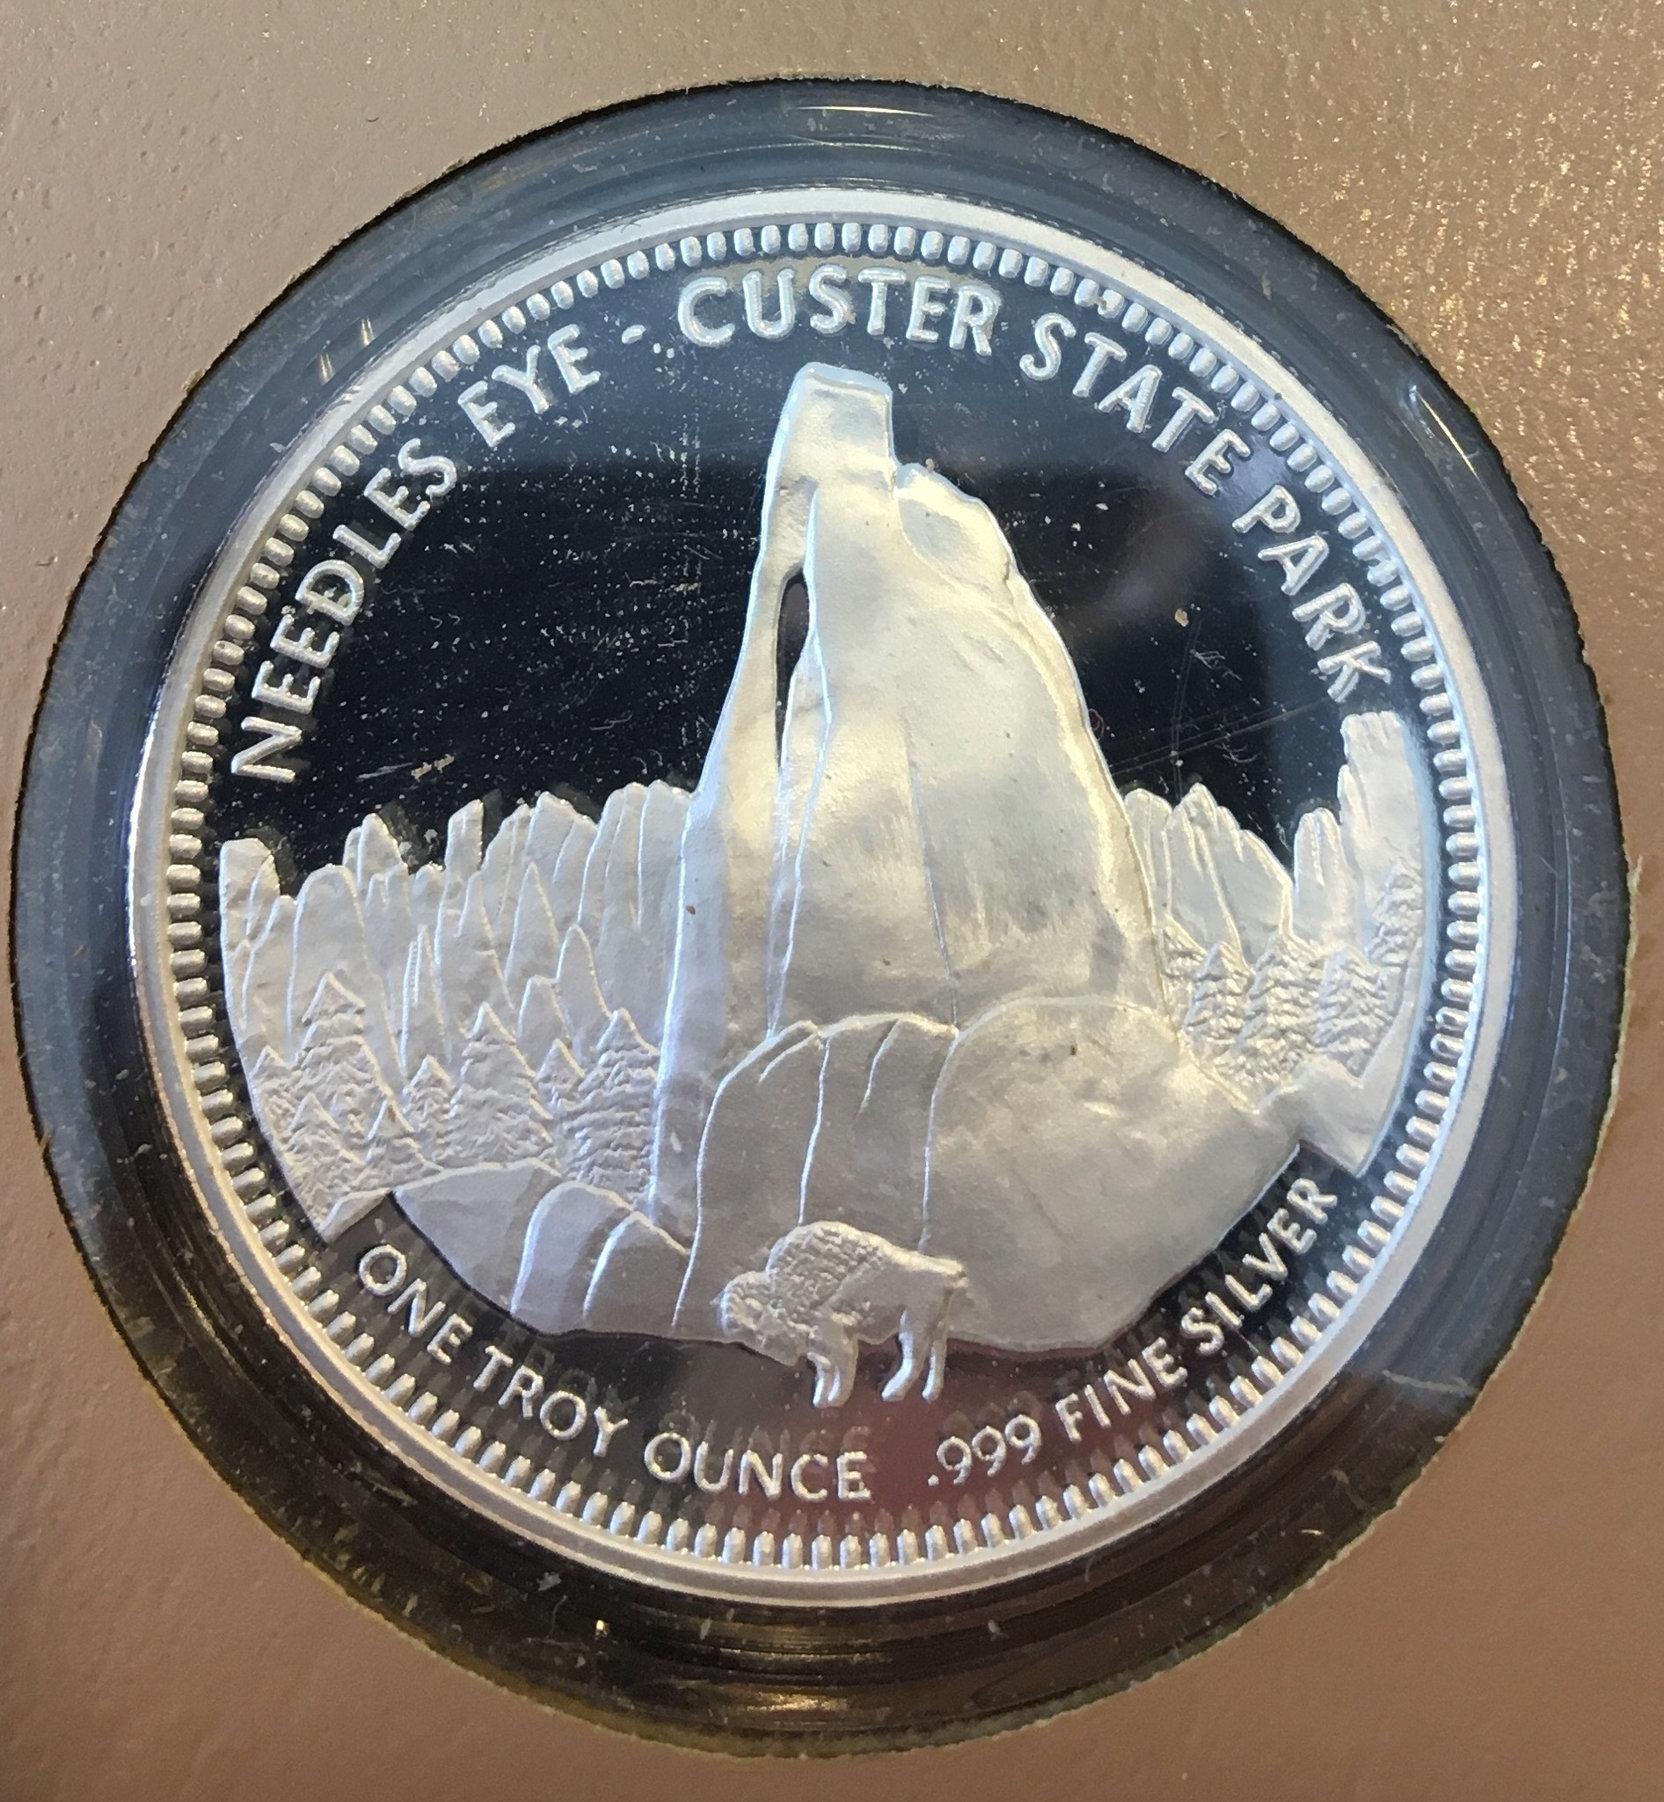 Silver of Sturgis — Collectors Universe